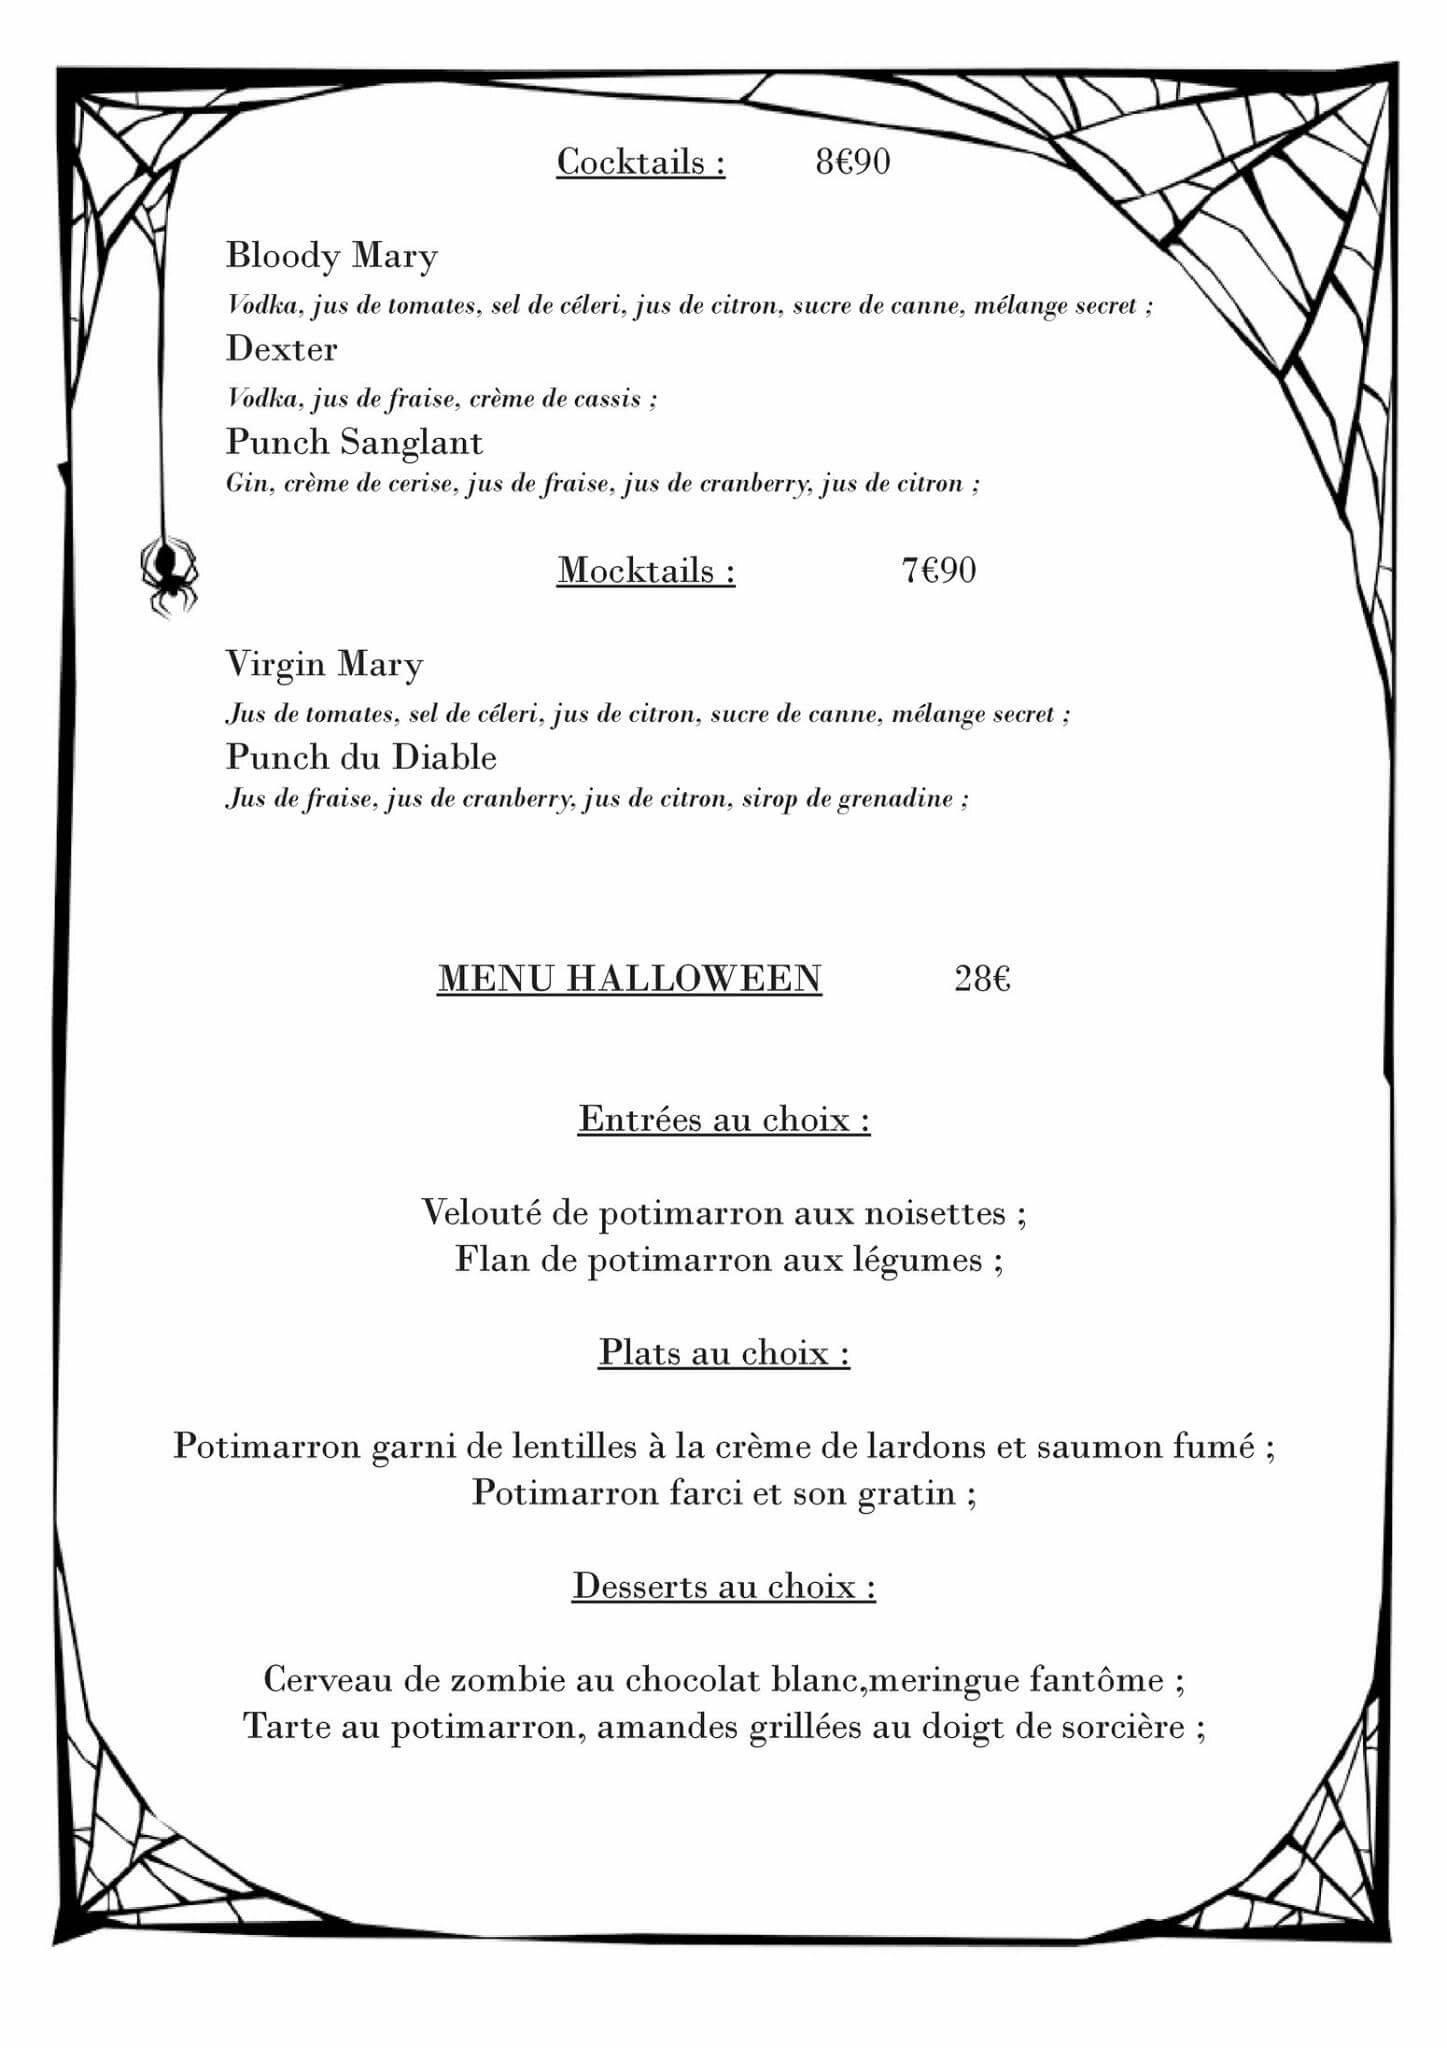 Le Zebre Magny Le Hongre halloween 2017 au val d'europe – val d'europe serrisinfos